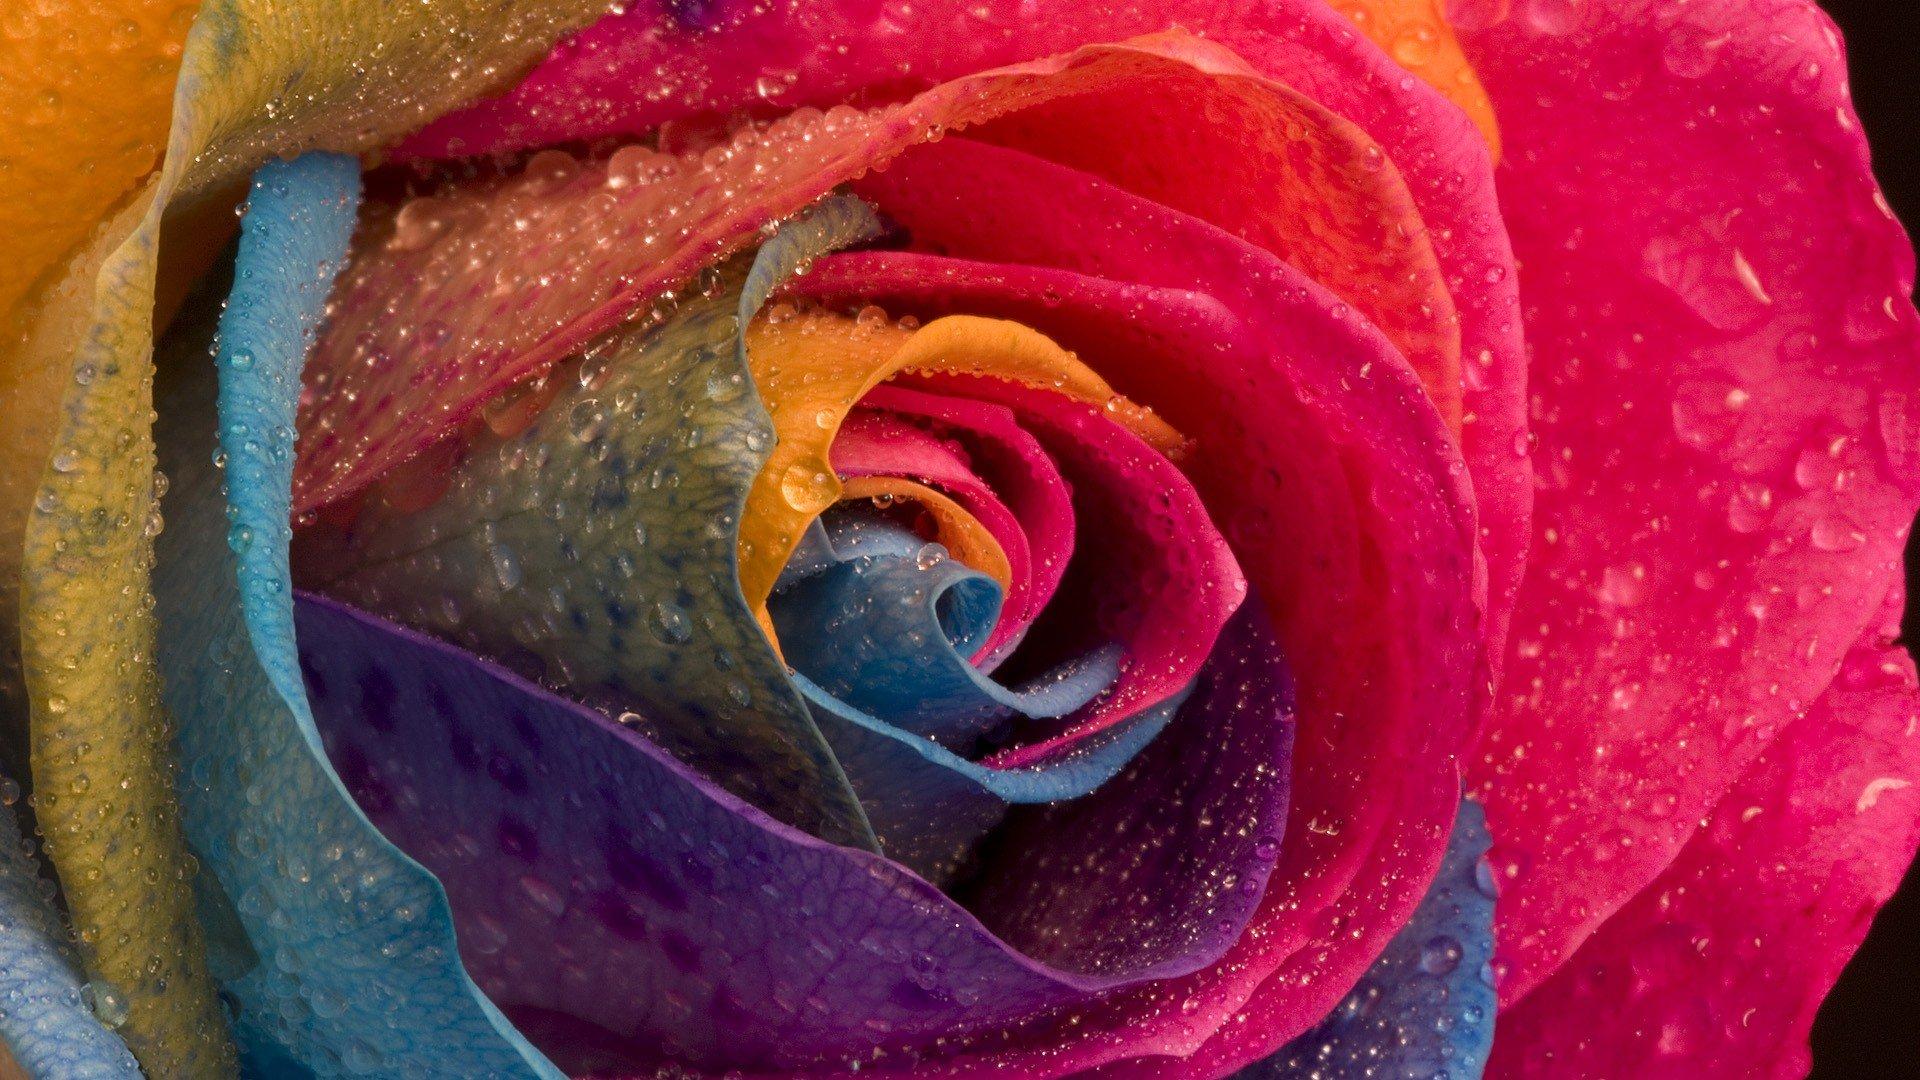 Drops Rainbow 3d Wallpaper Multicolor Flowers Water Drops Macro Roses Wallpaper